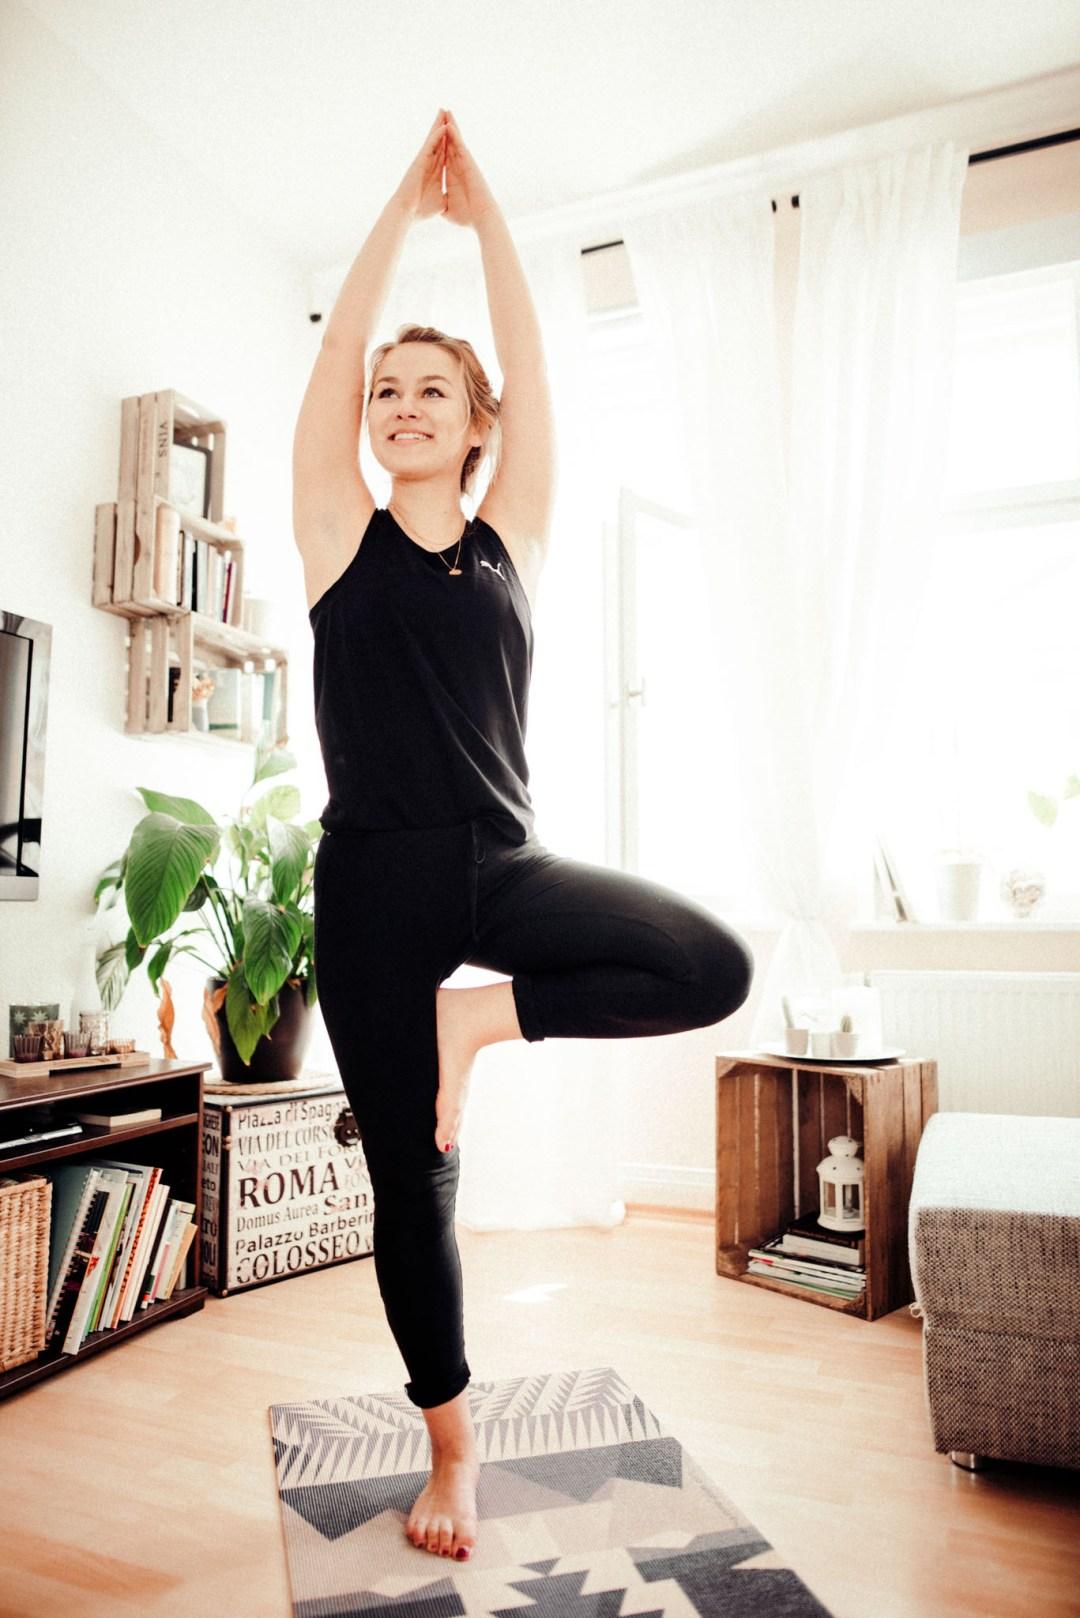 Gym oder Homeworkout? - die beste Yoga-App